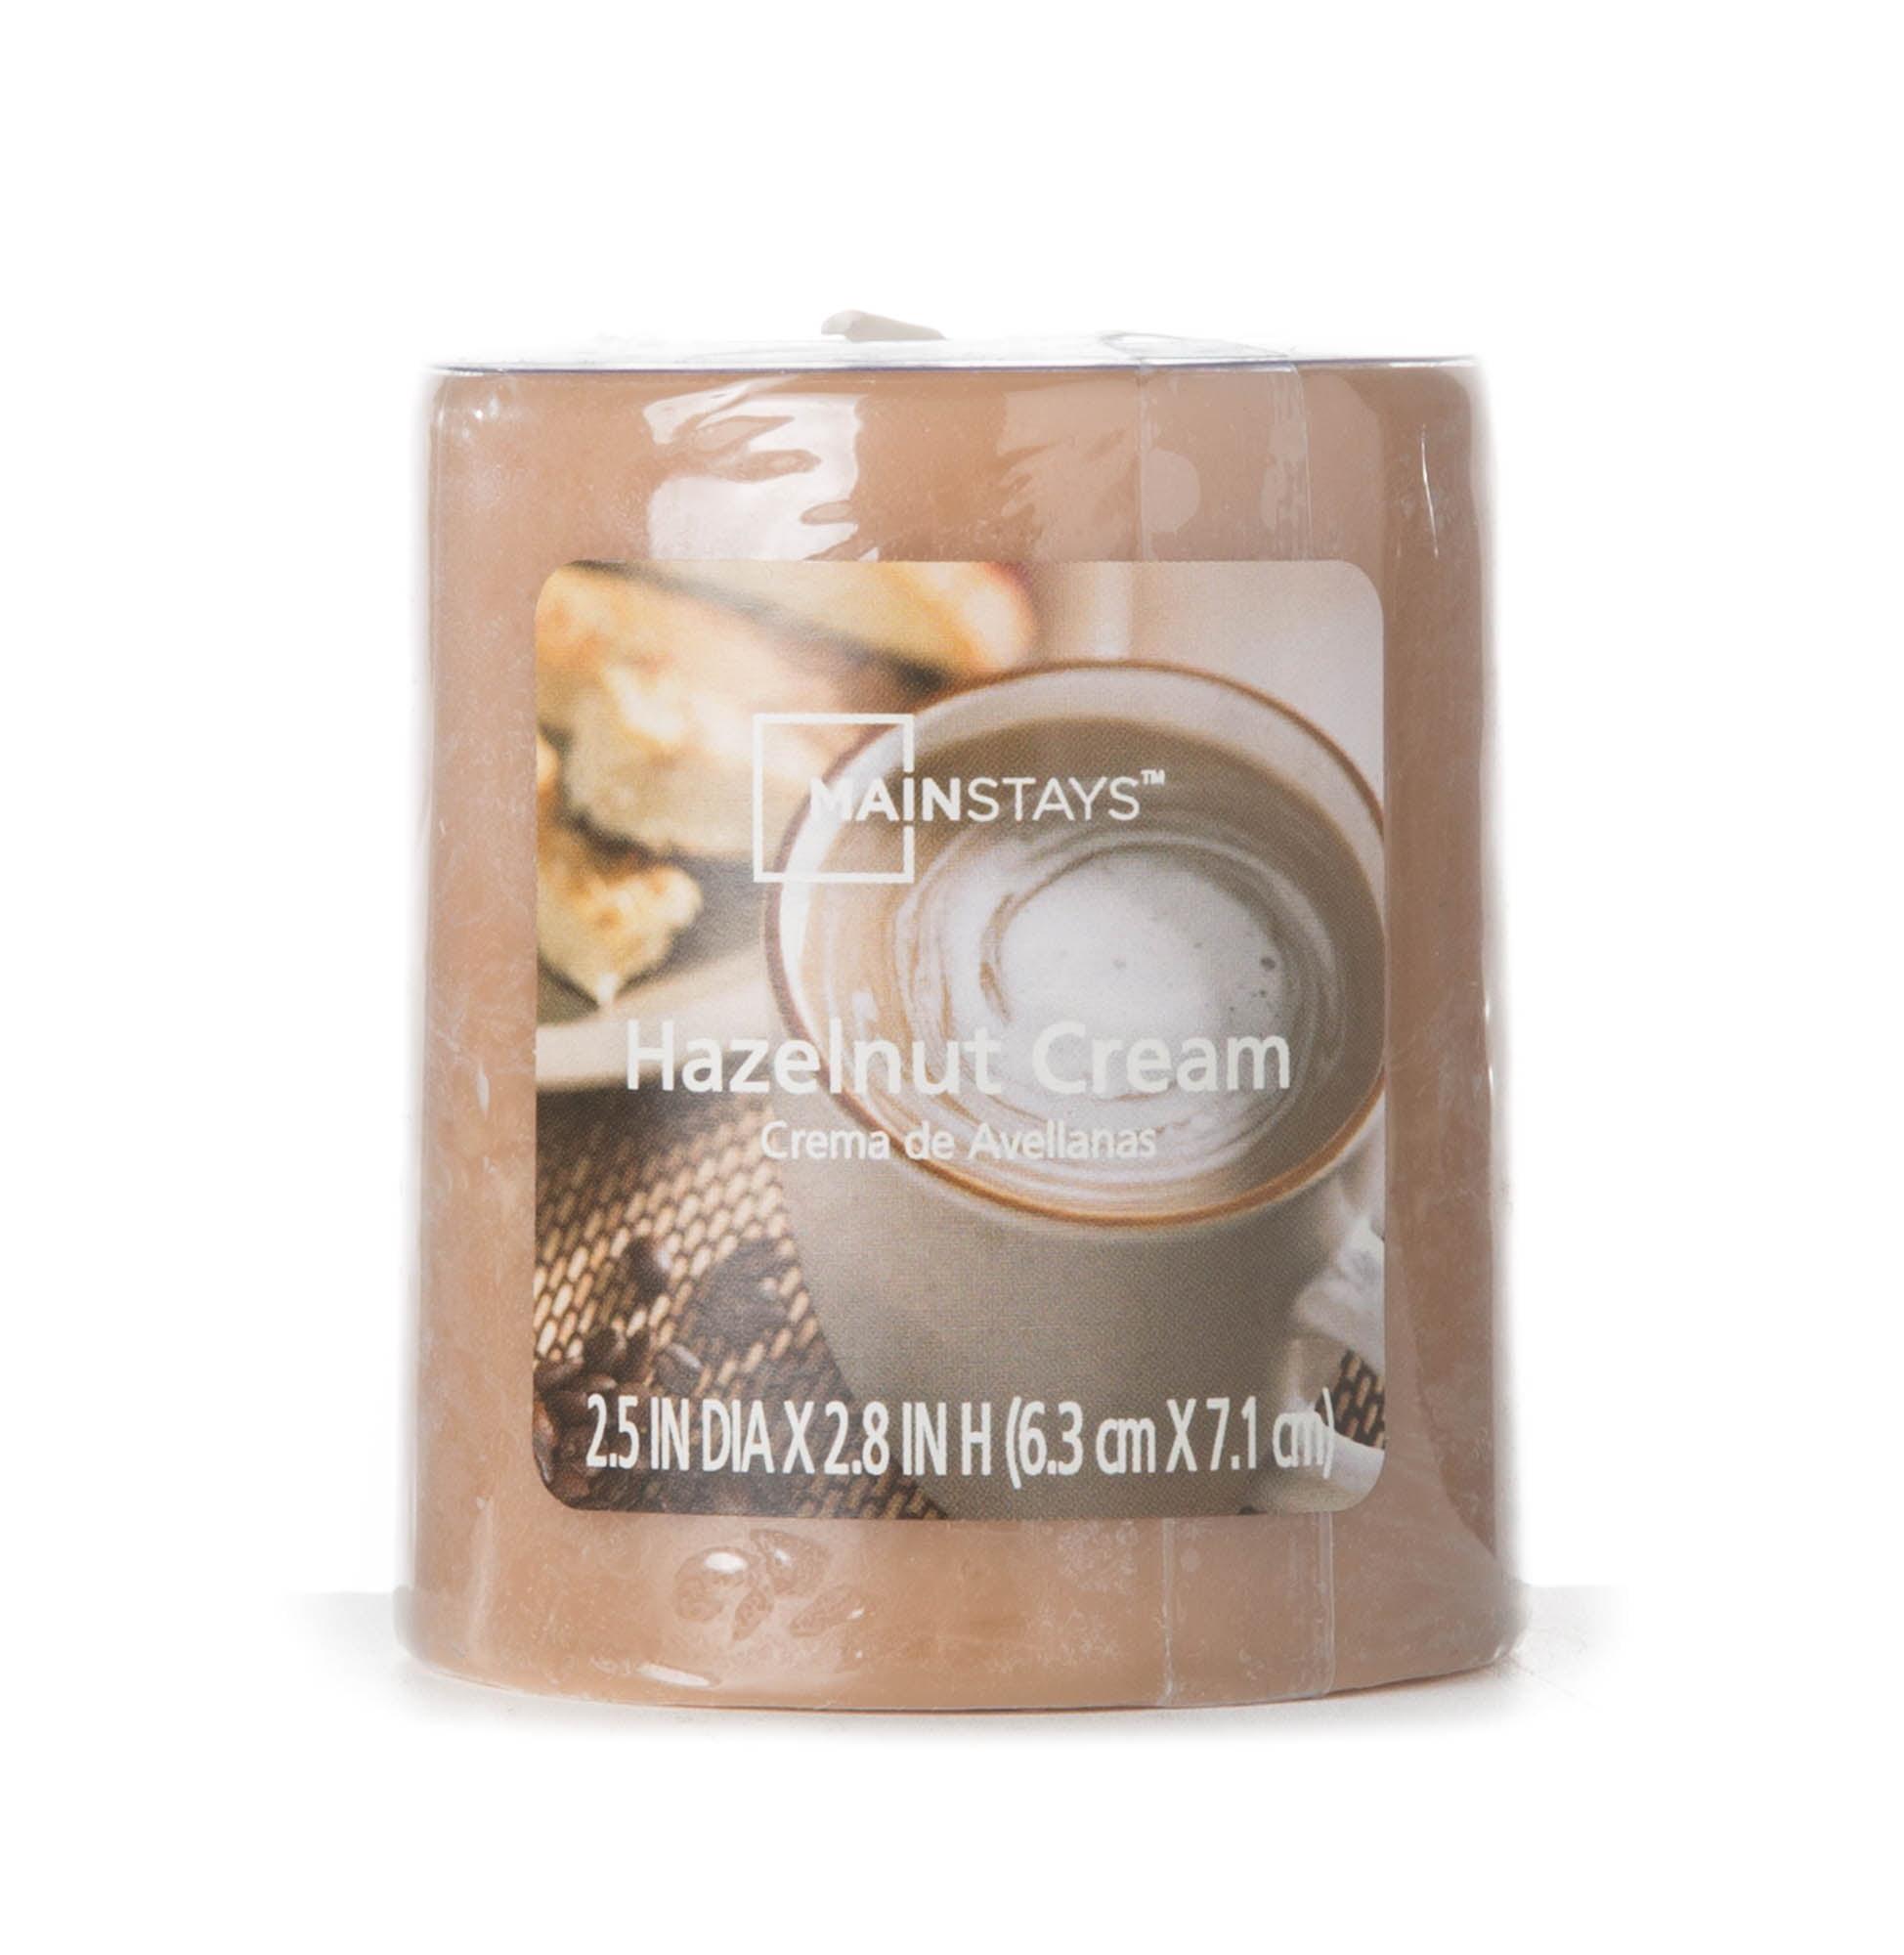 "Mainstays 2.8"" Pillar Candle, Hazelnut Cream by MVP Group International"